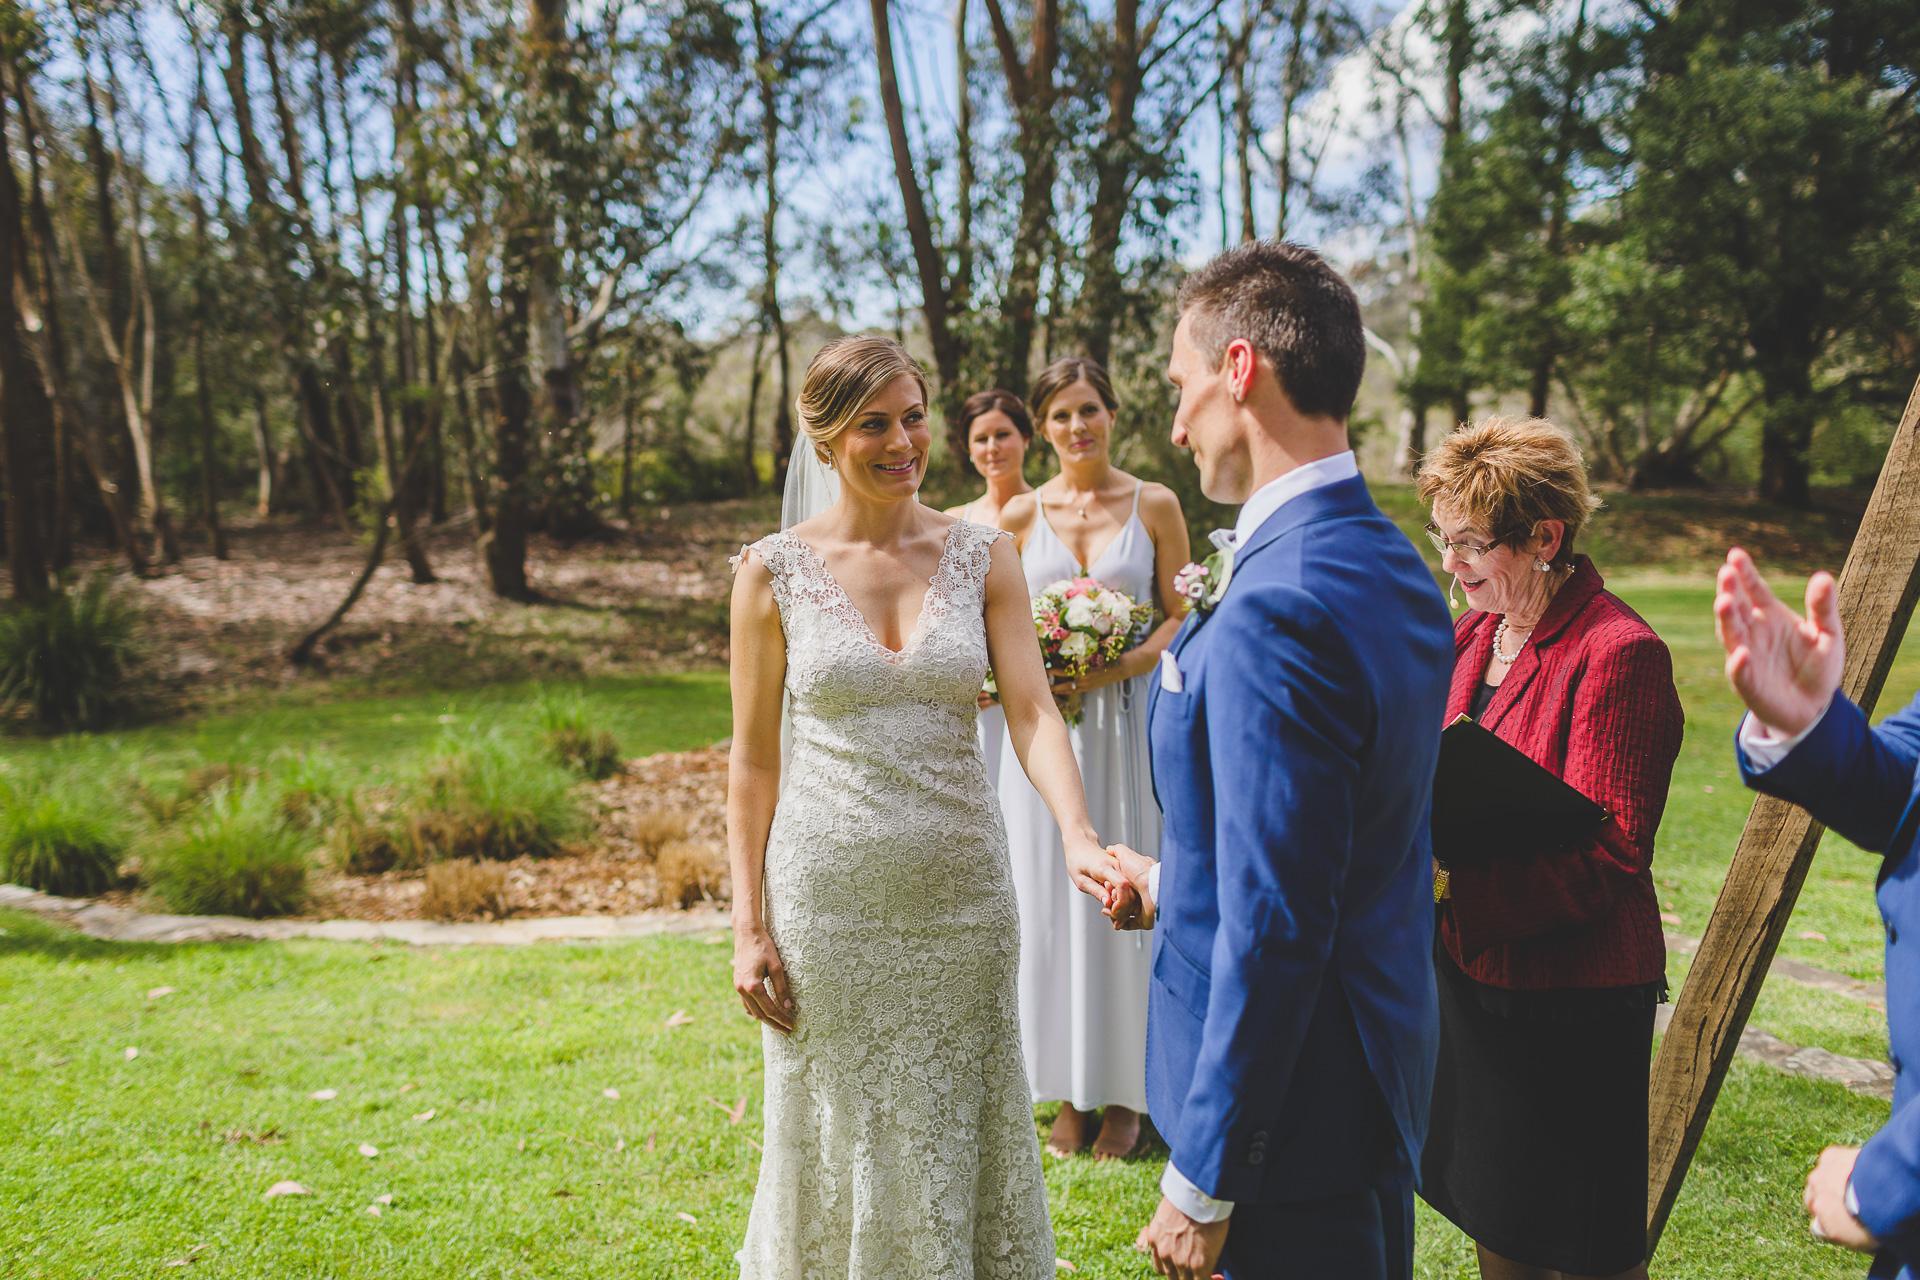 20161112 - Heath_Ruth_Wombat_Hollow_Wedding | 116.jpg